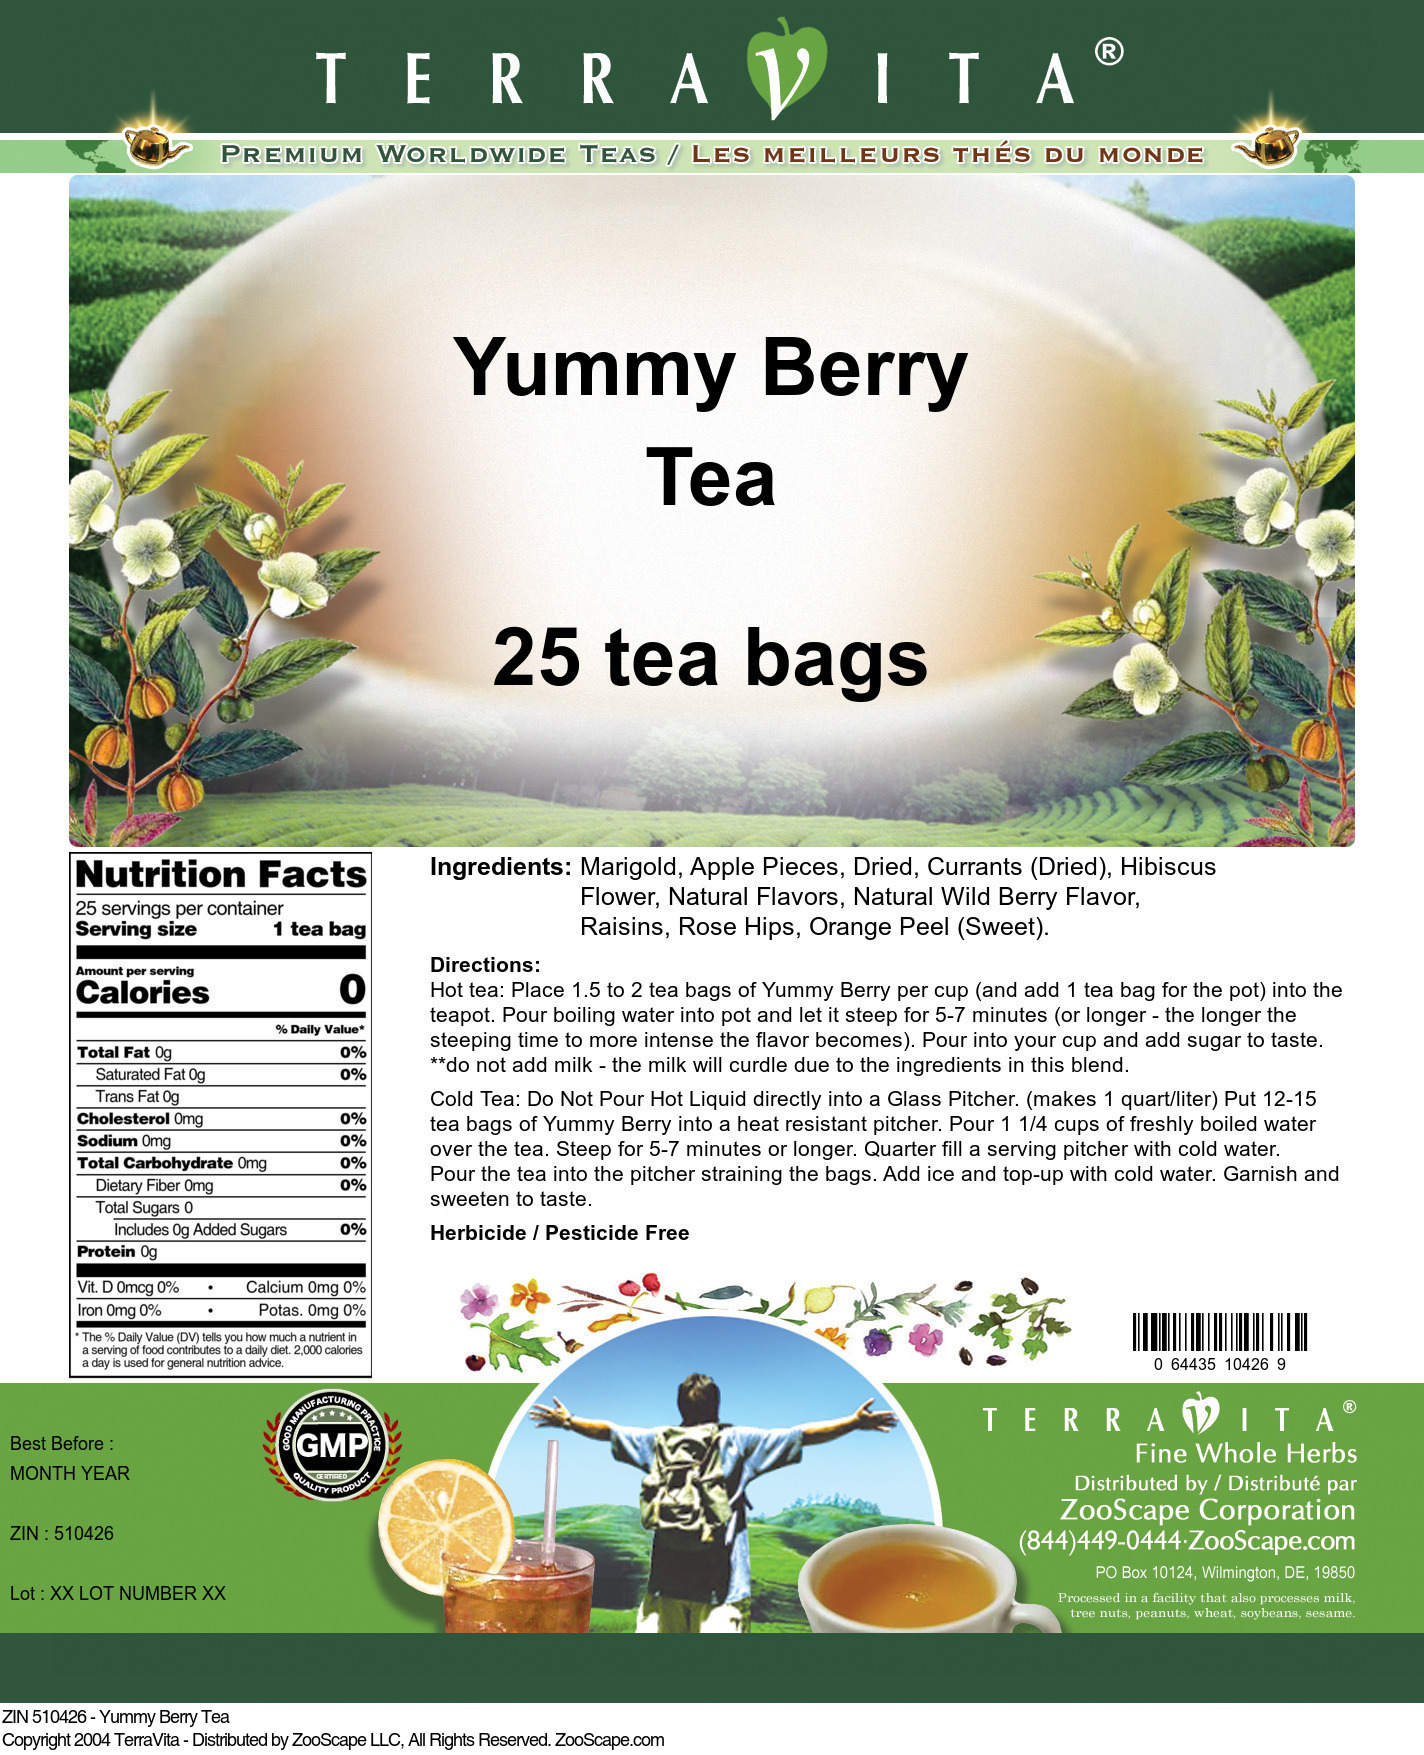 Yummy Berry Tea